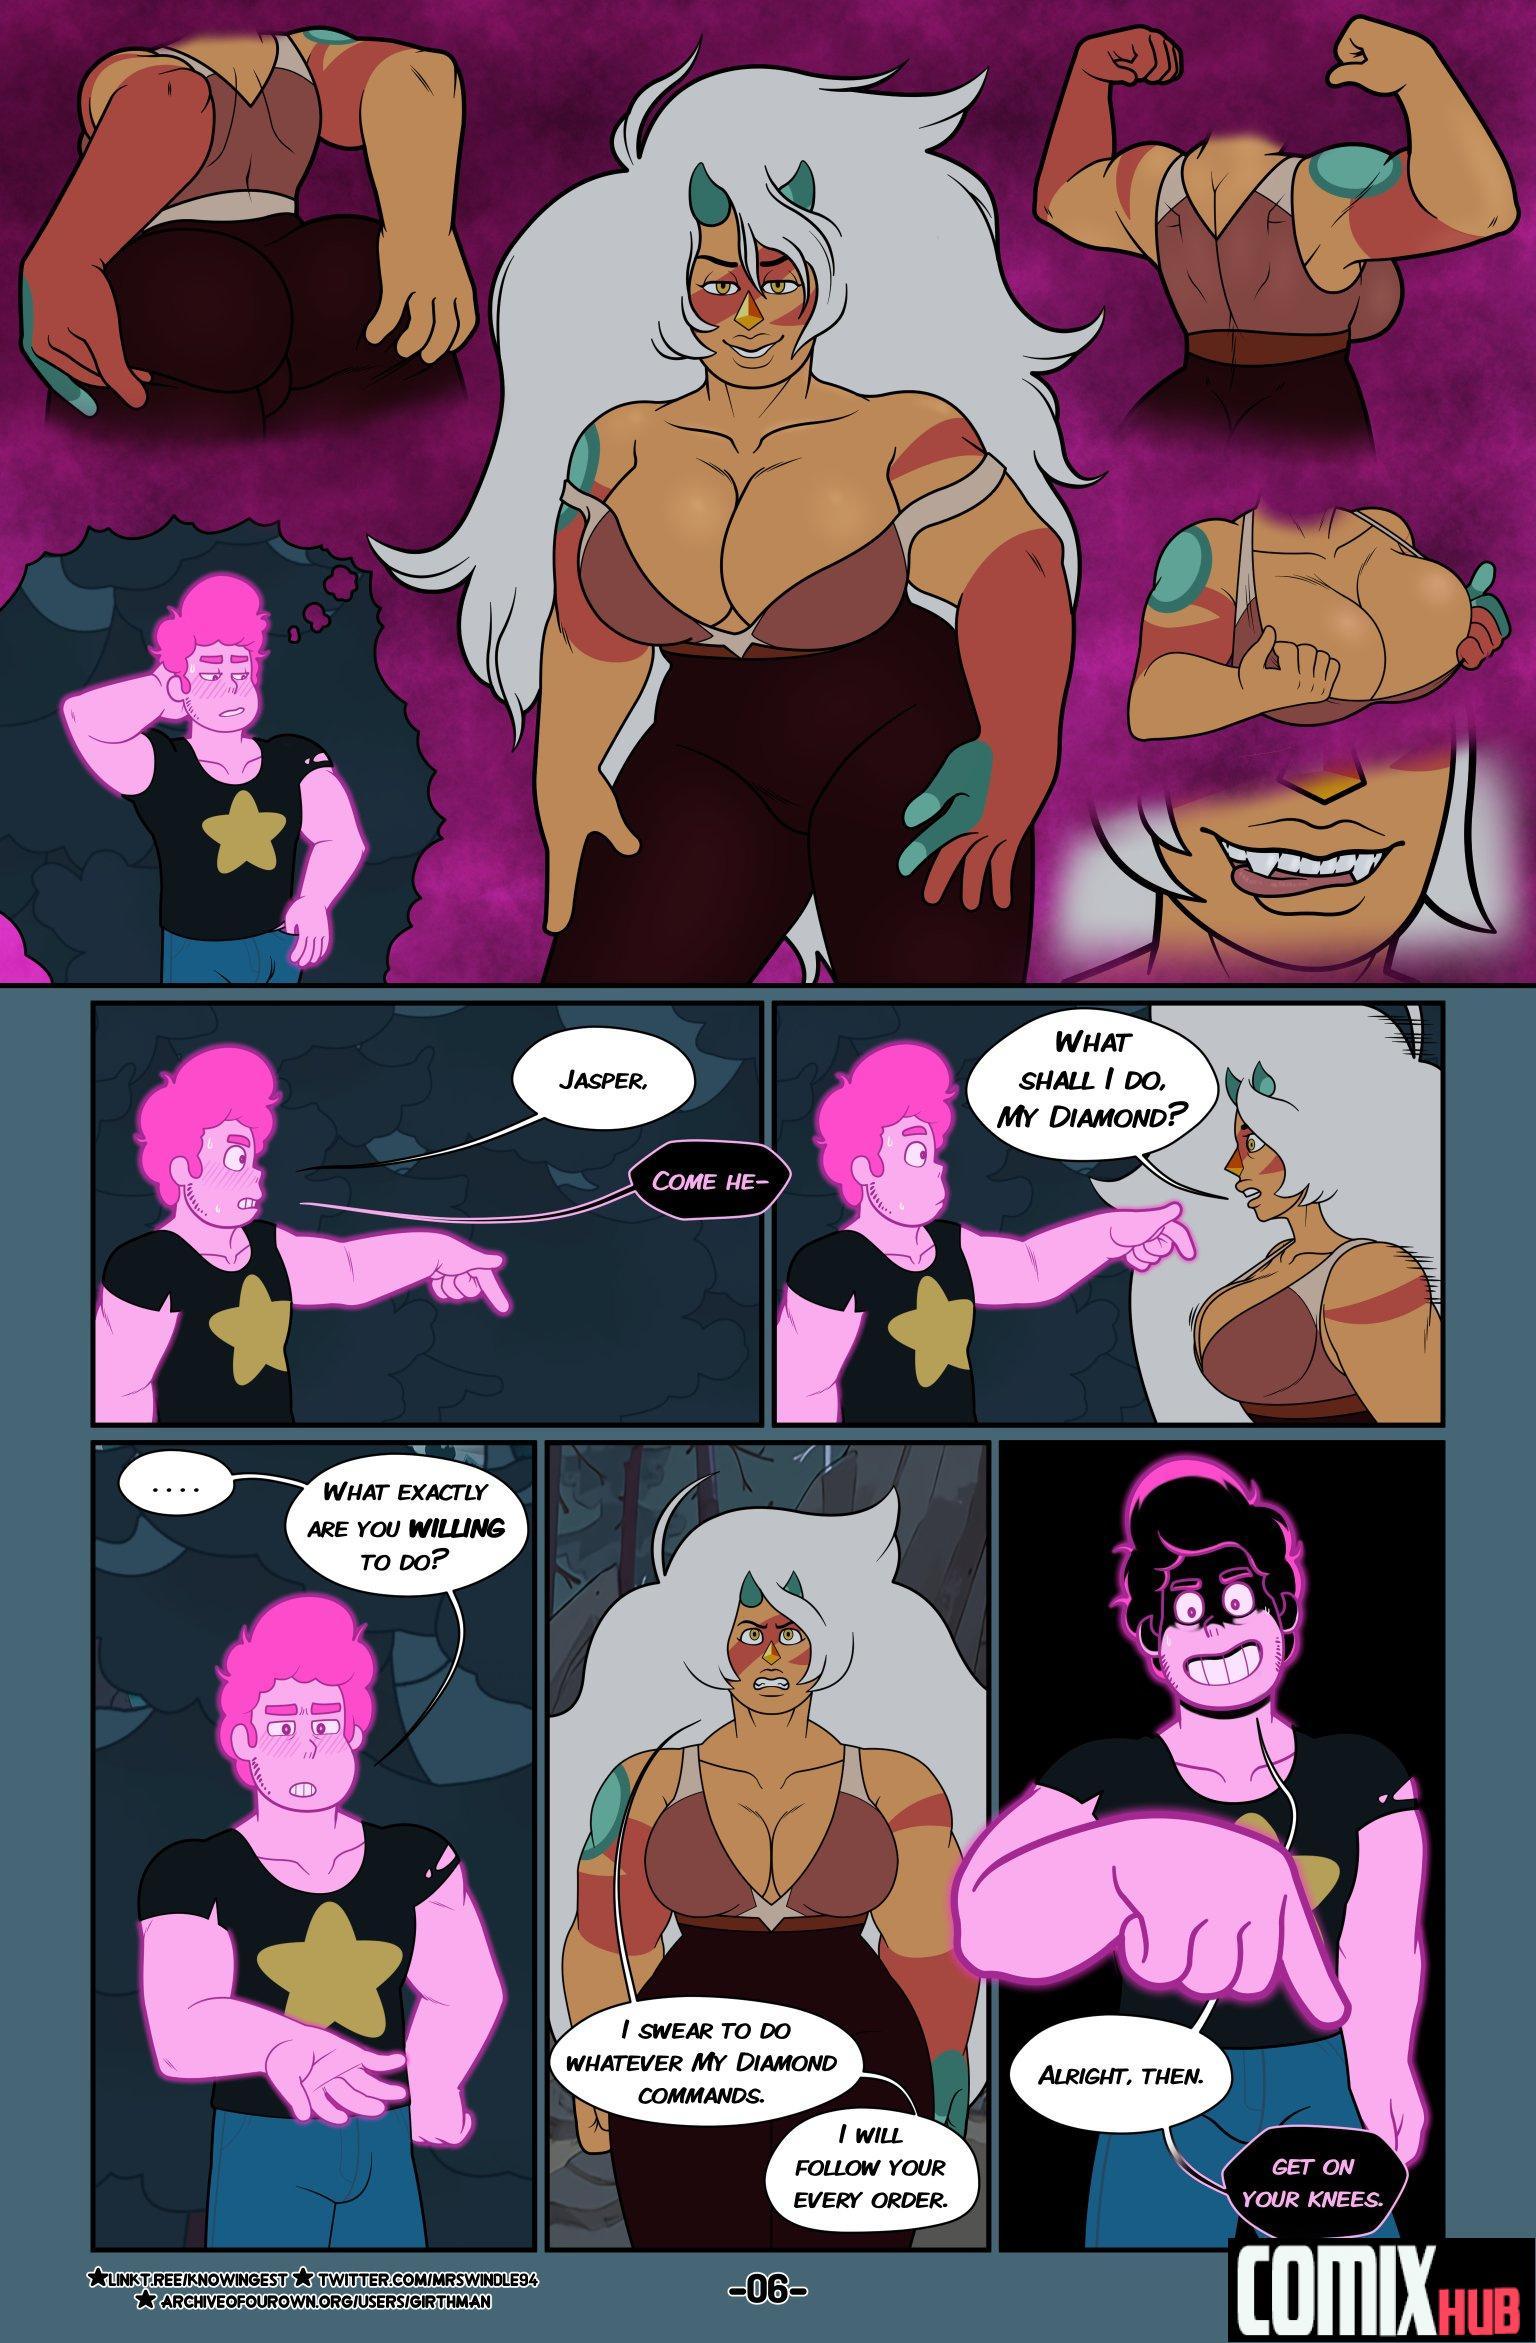 Porn comics, Steven Universe Fervor 1 Oral sex, Big Tits, Blowjob, Creampie, Cum Swallow, Domination, Fantasy, Monster Girls, Submission